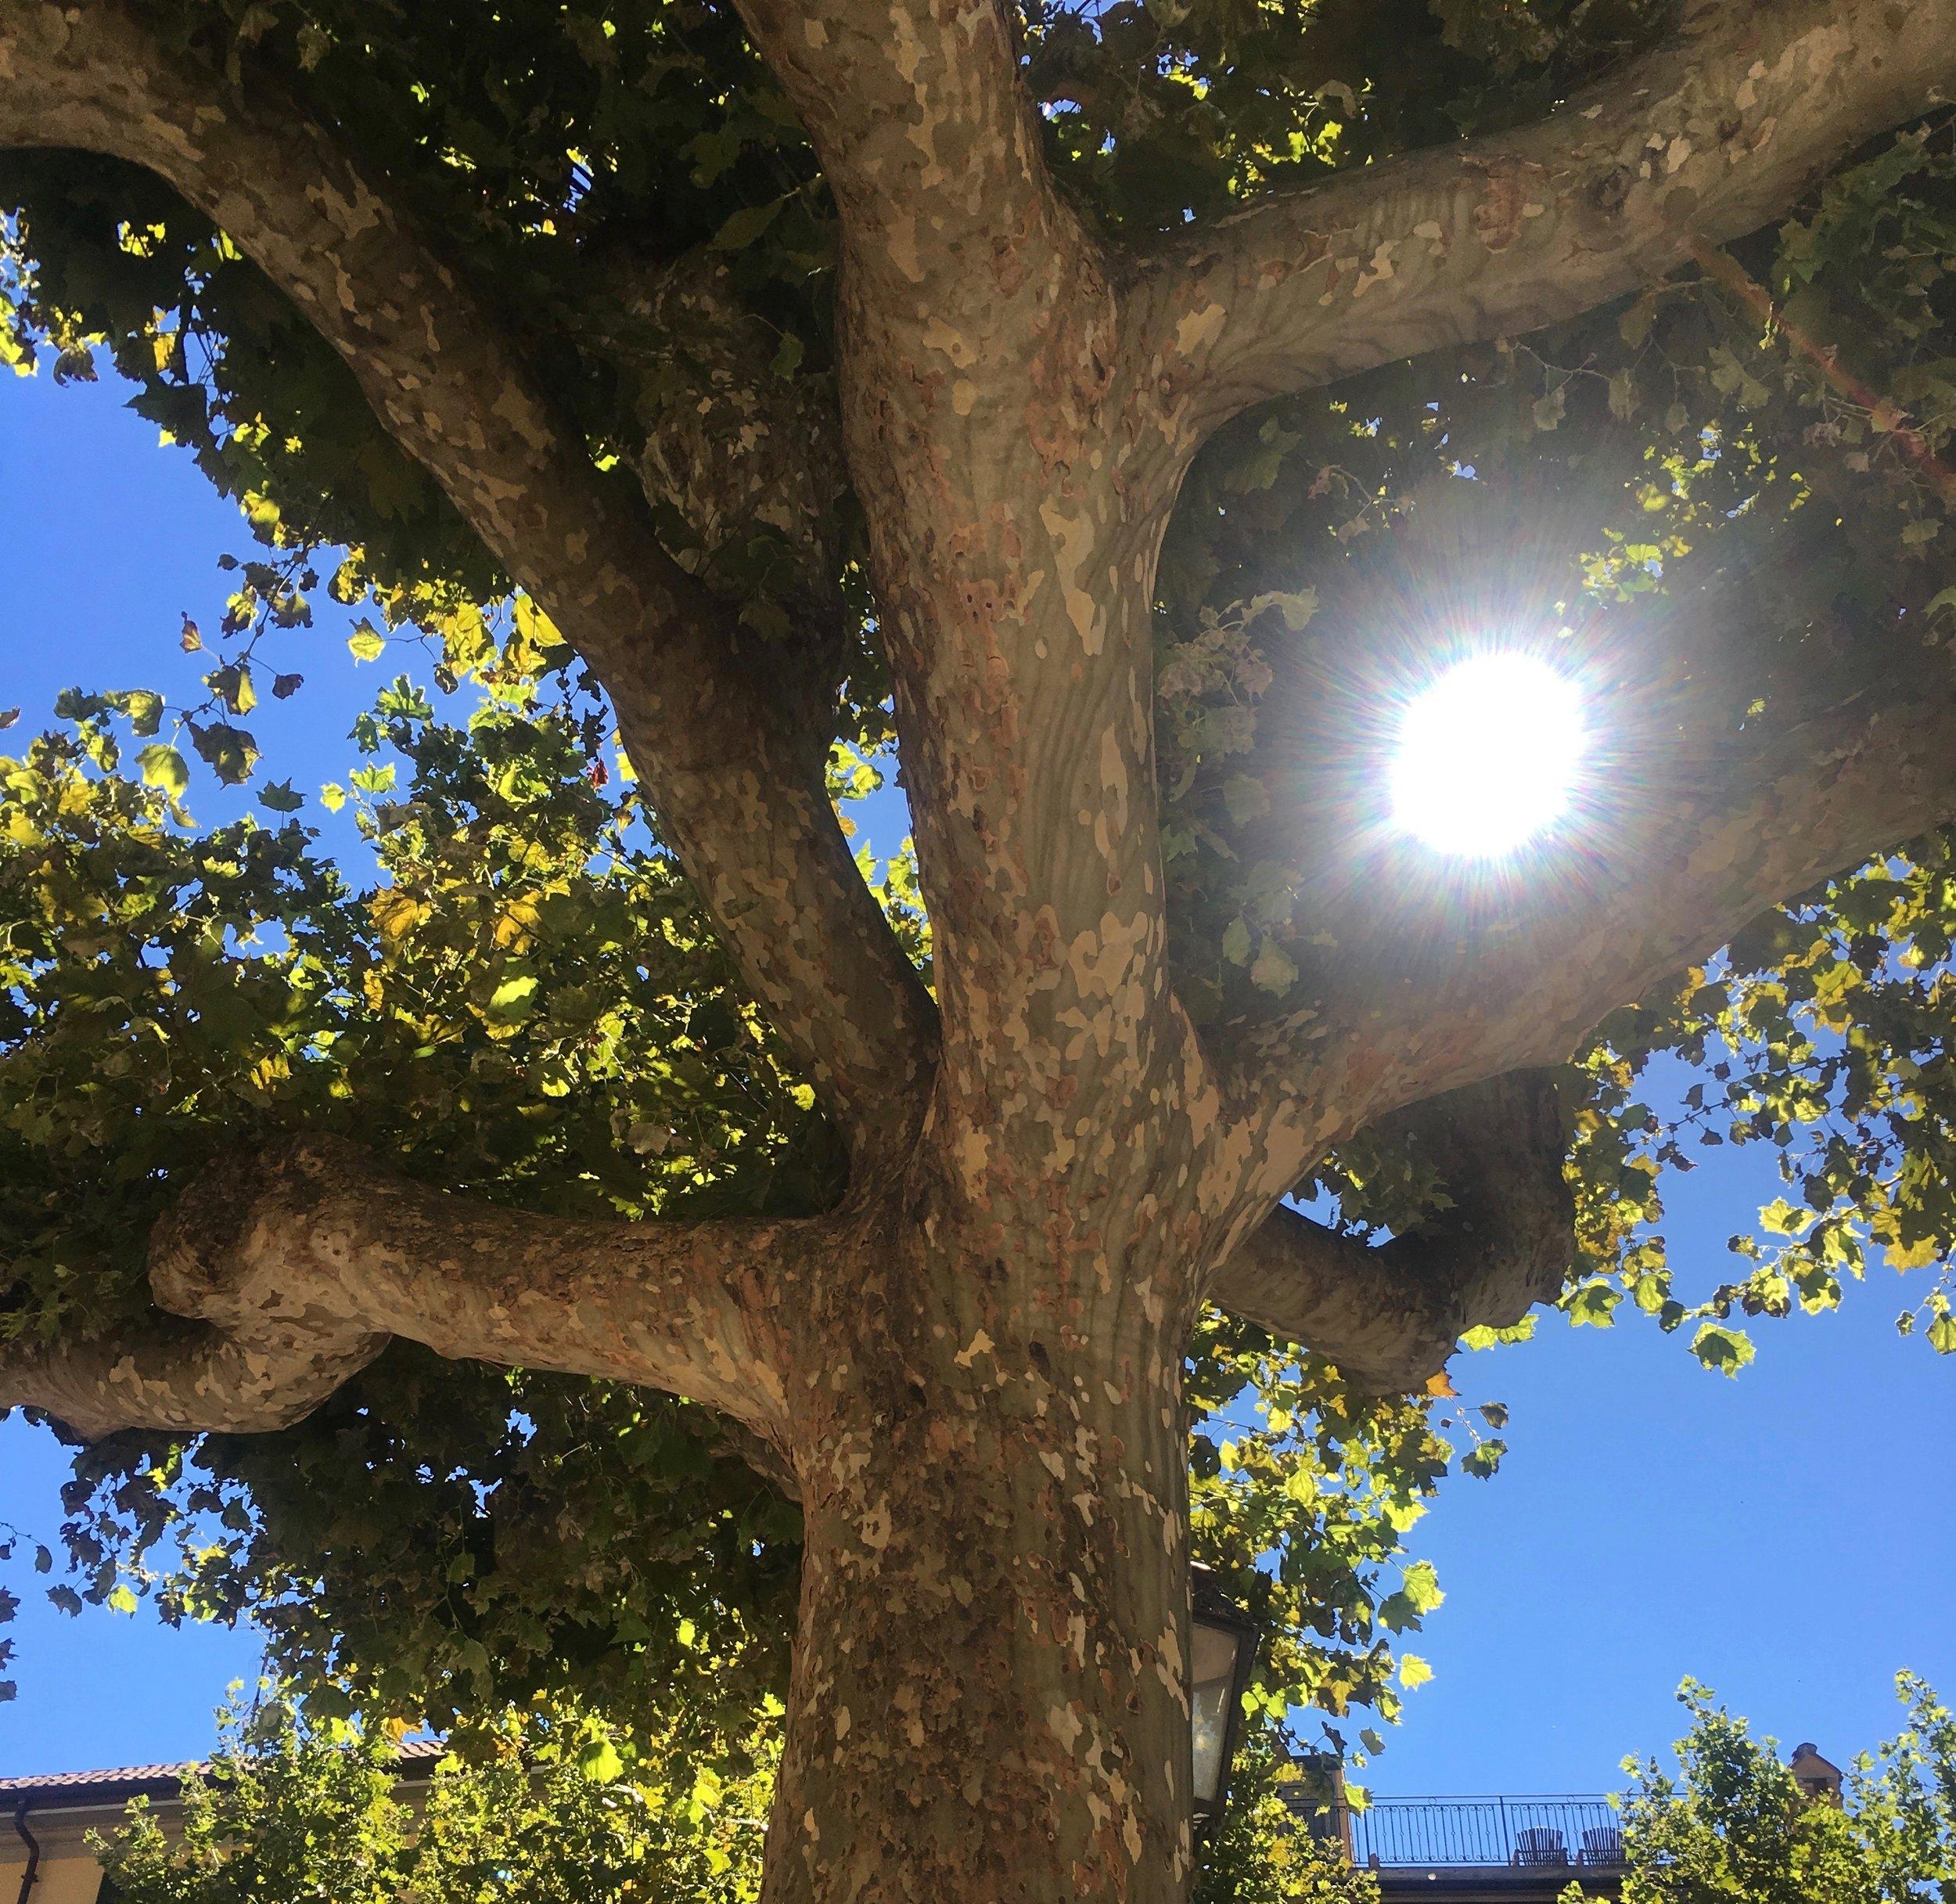 Sunlight filtering through the leaves in Varenna, Italy.